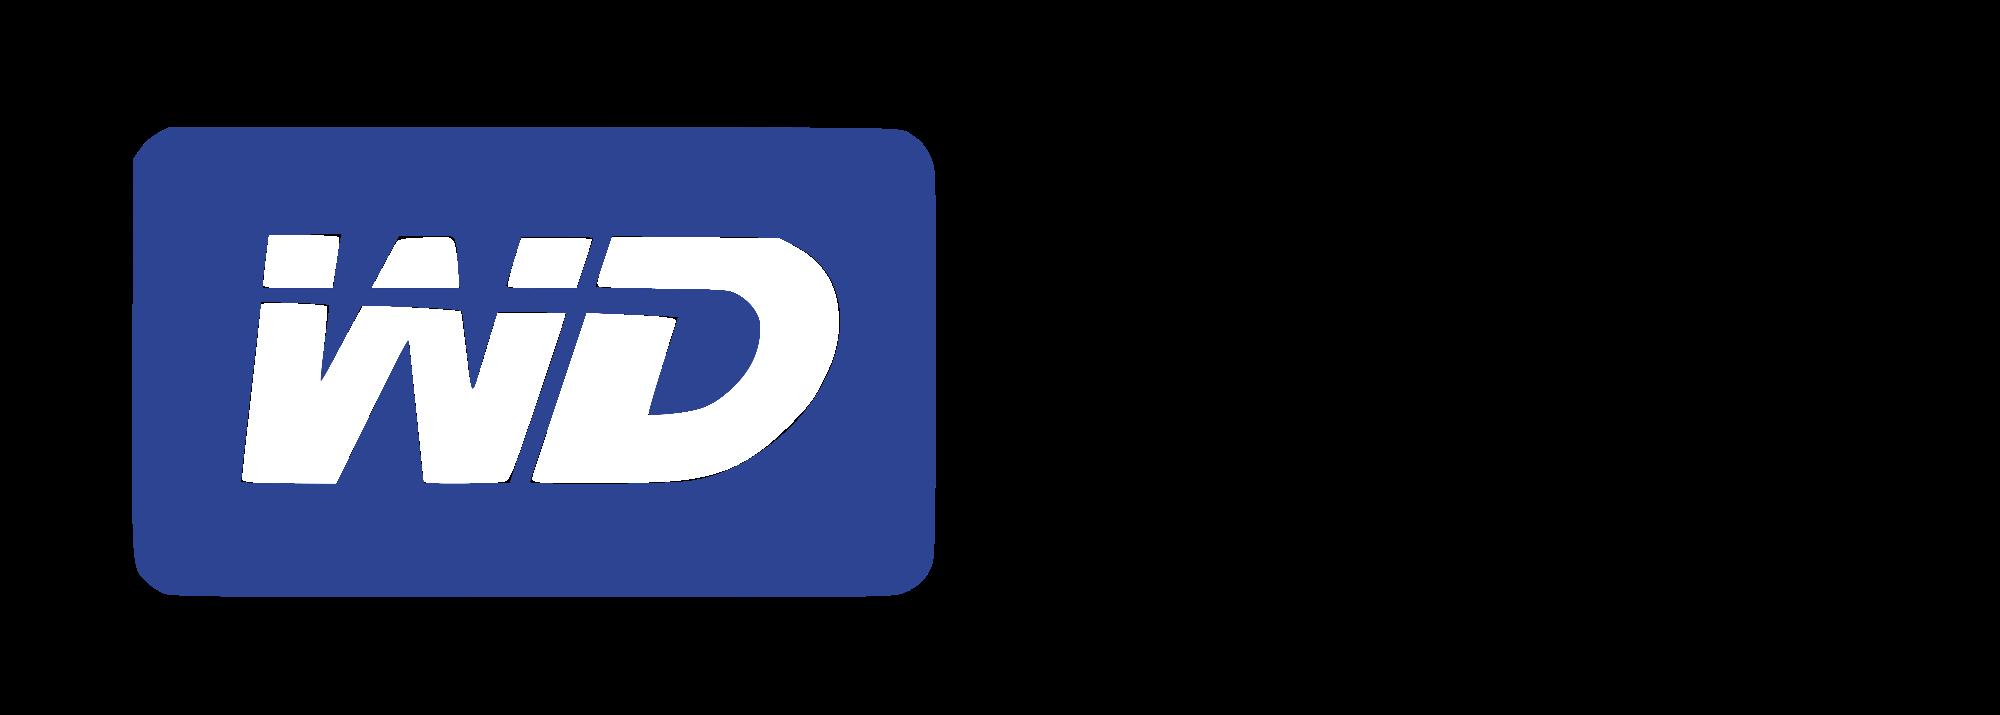 Western Digital Logo 4 - Western Digital Logo